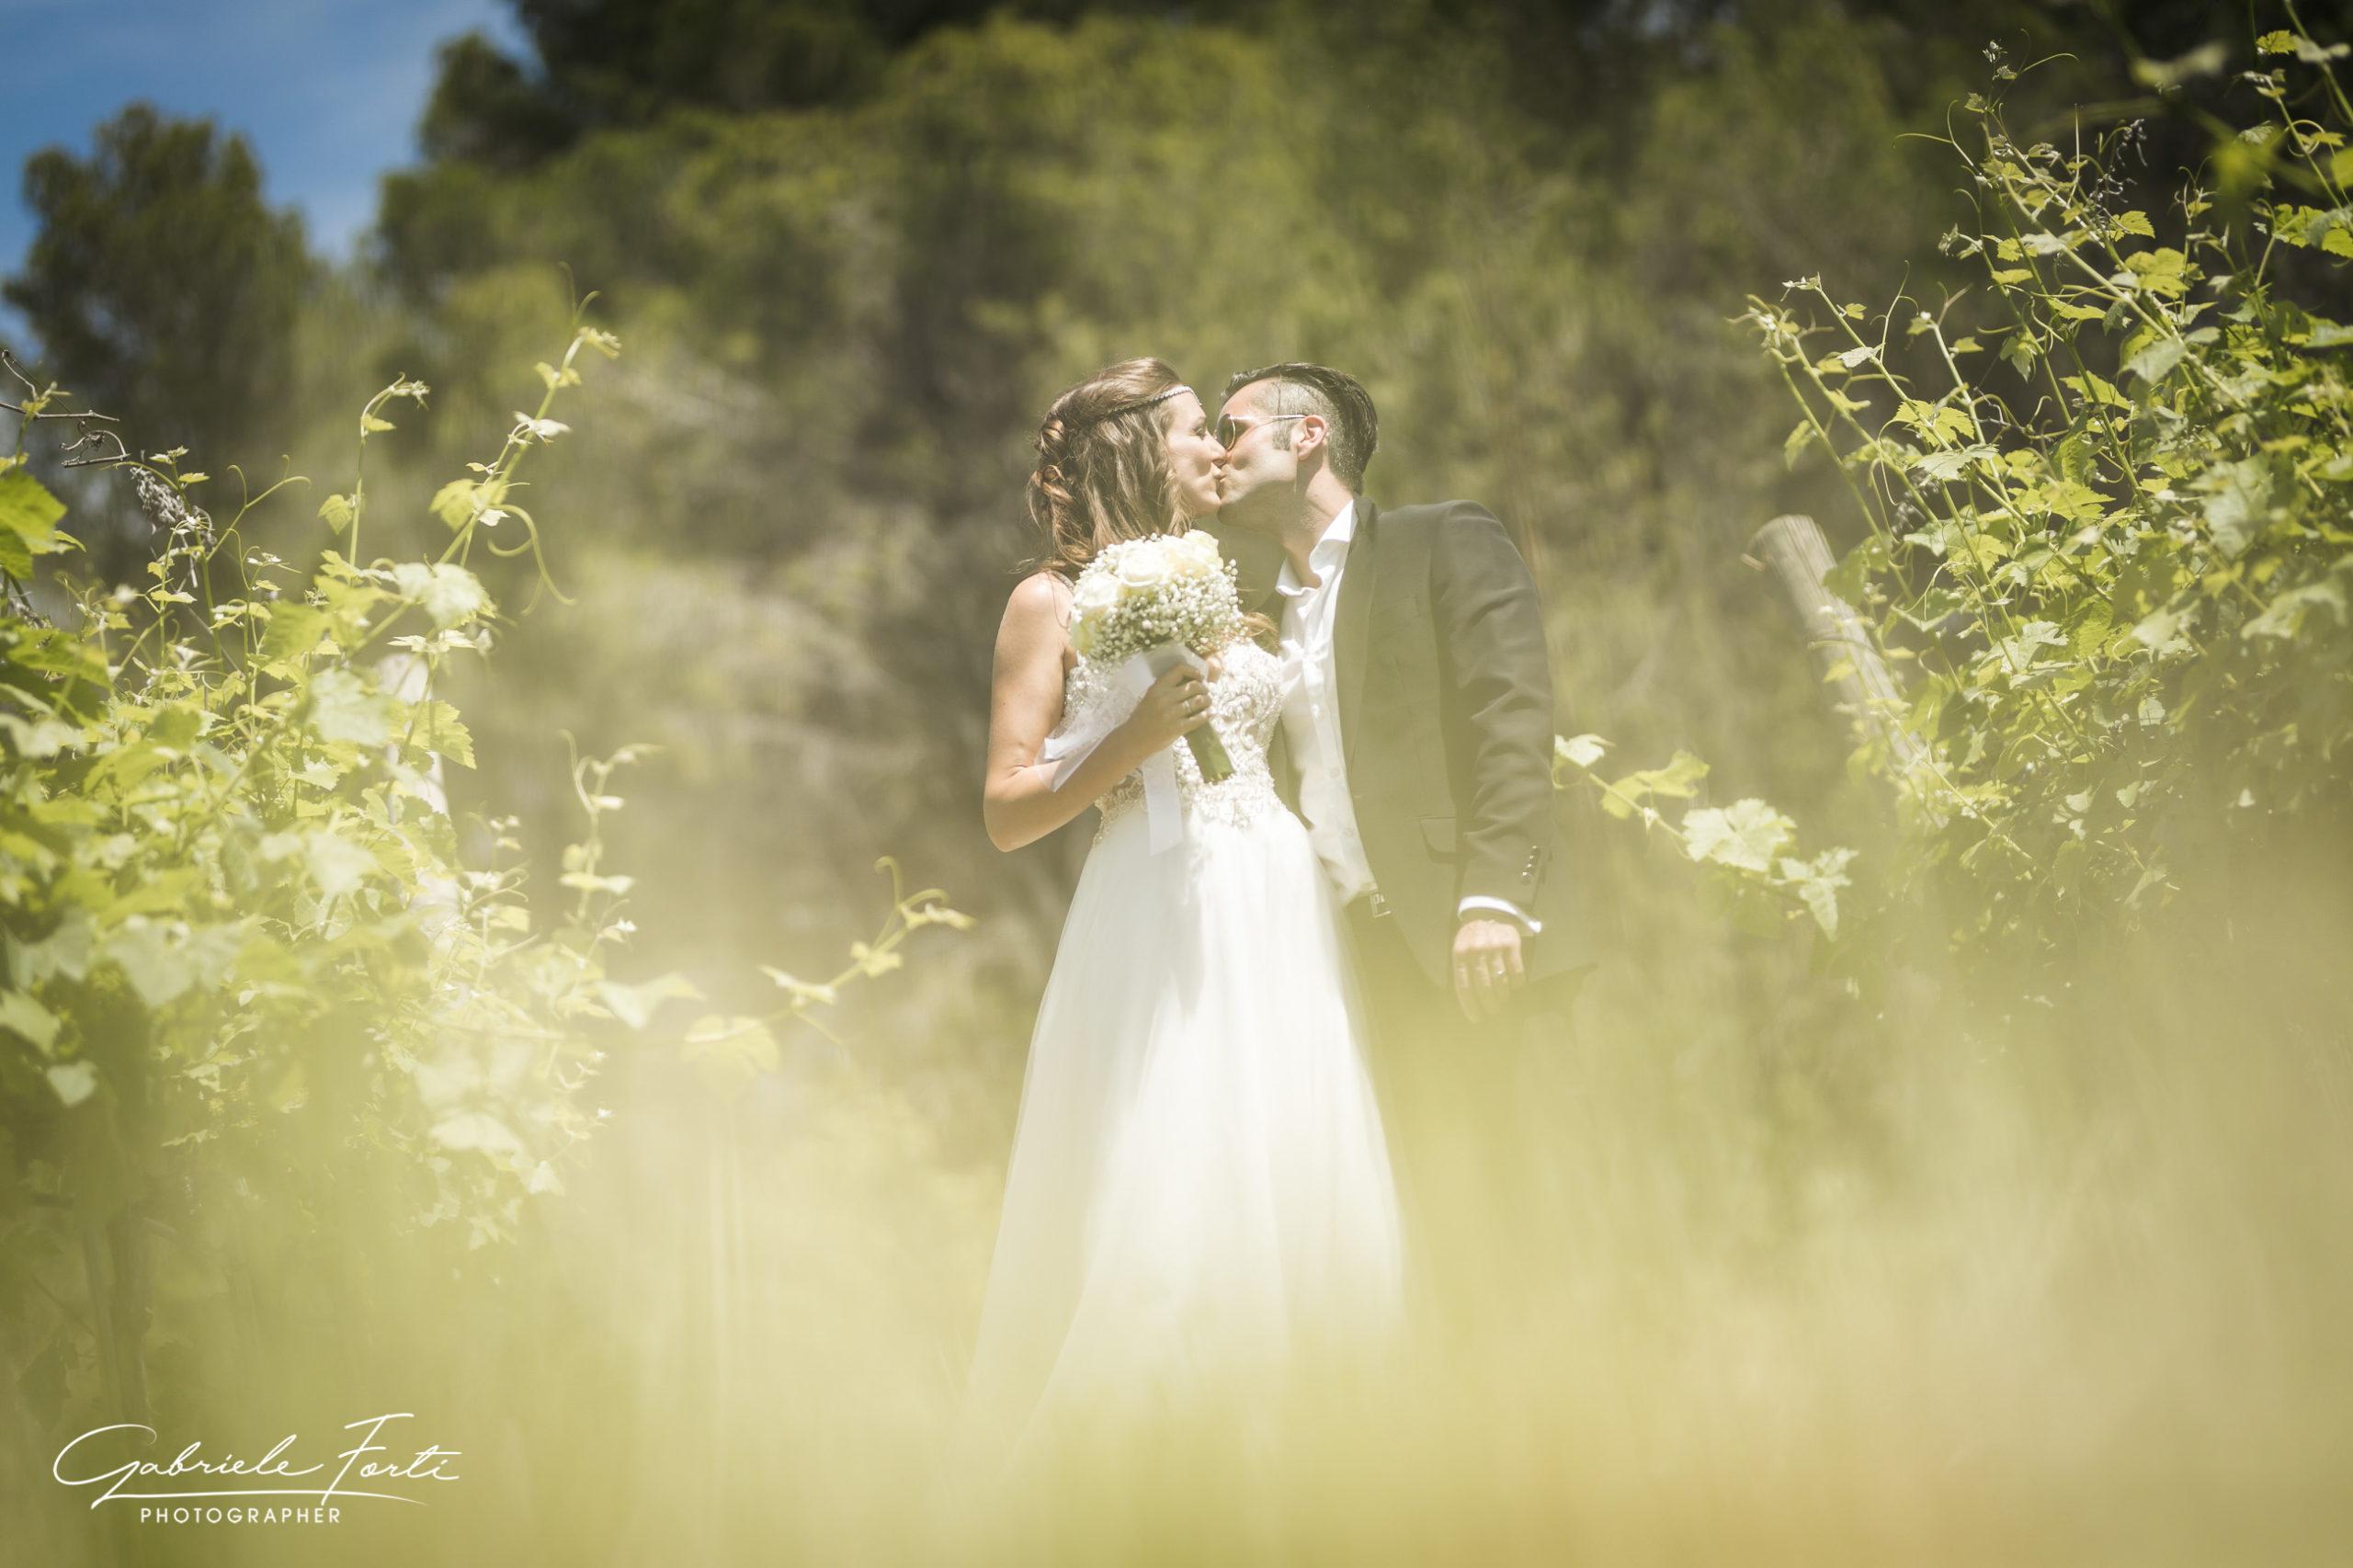 castello-banfi-wedding-piani-rossi-photo-shooting-italy-foto-forti-wedding-2